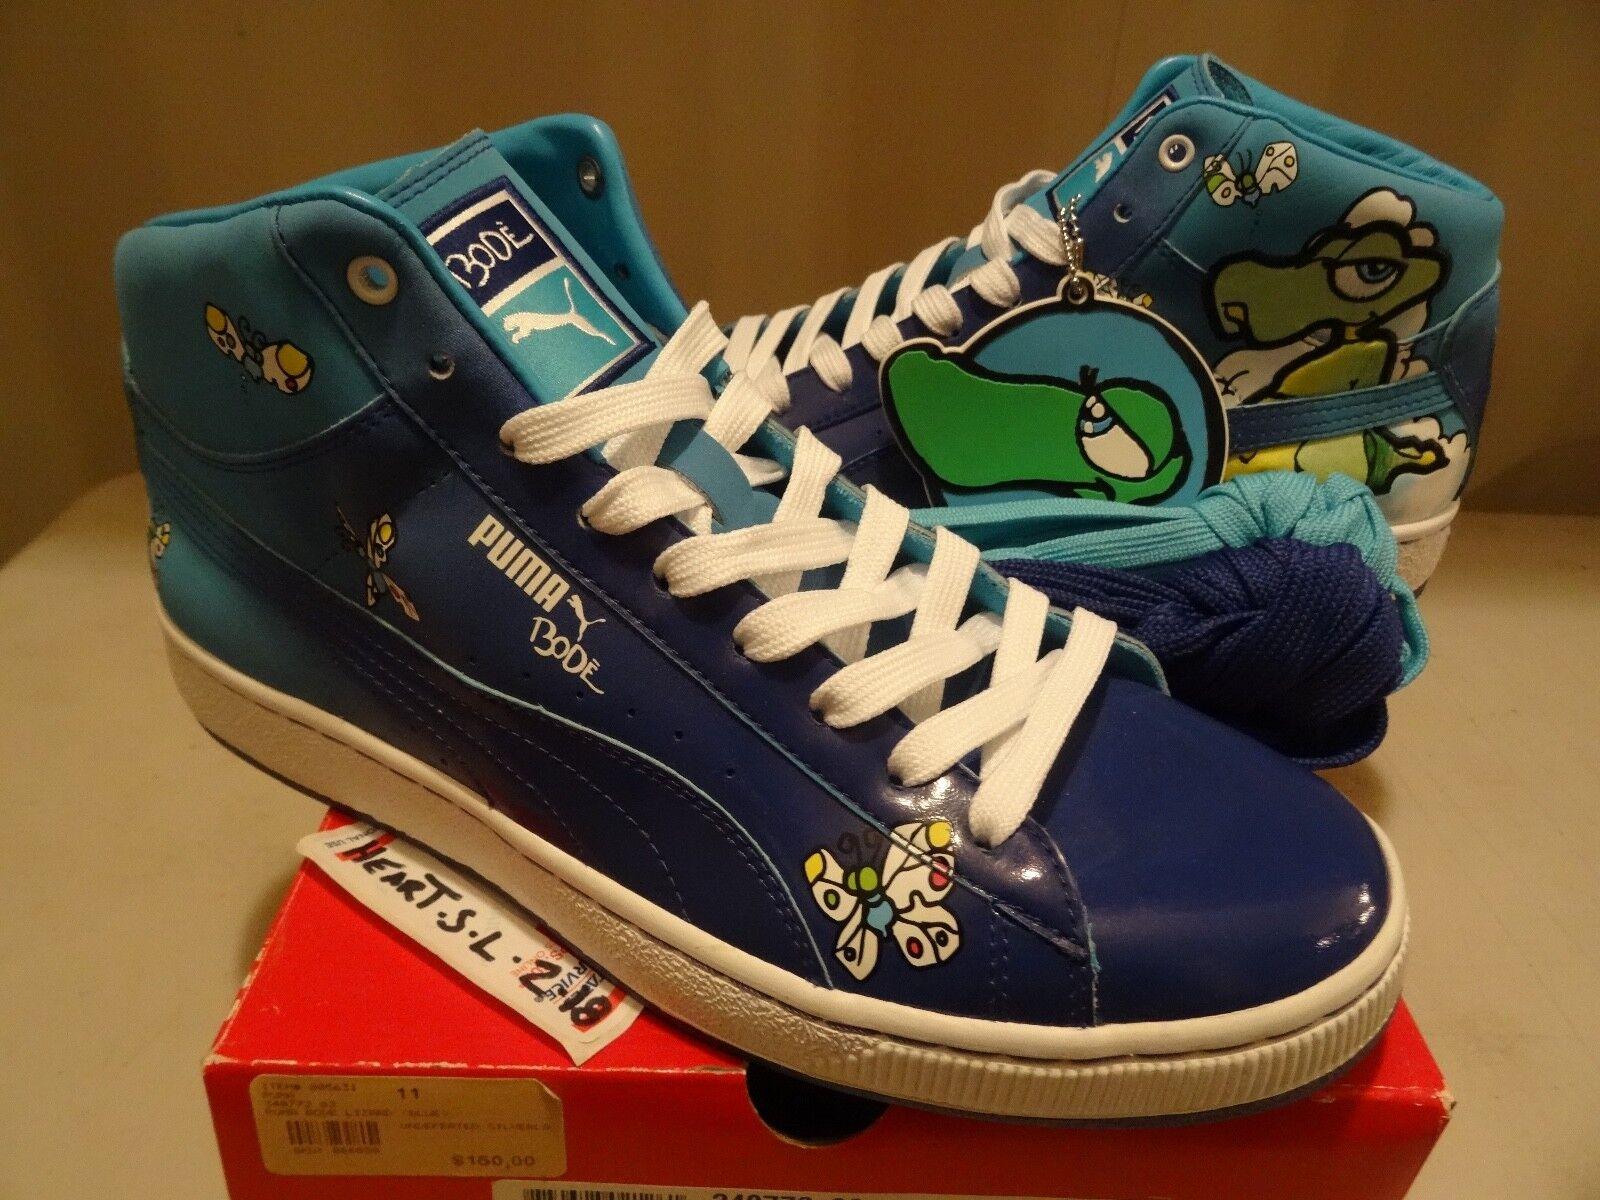 Nuevo PUMA x BODE Lagarto Azul Medio para Hombre Graffiti Arte Mariposa Raro 348772 02